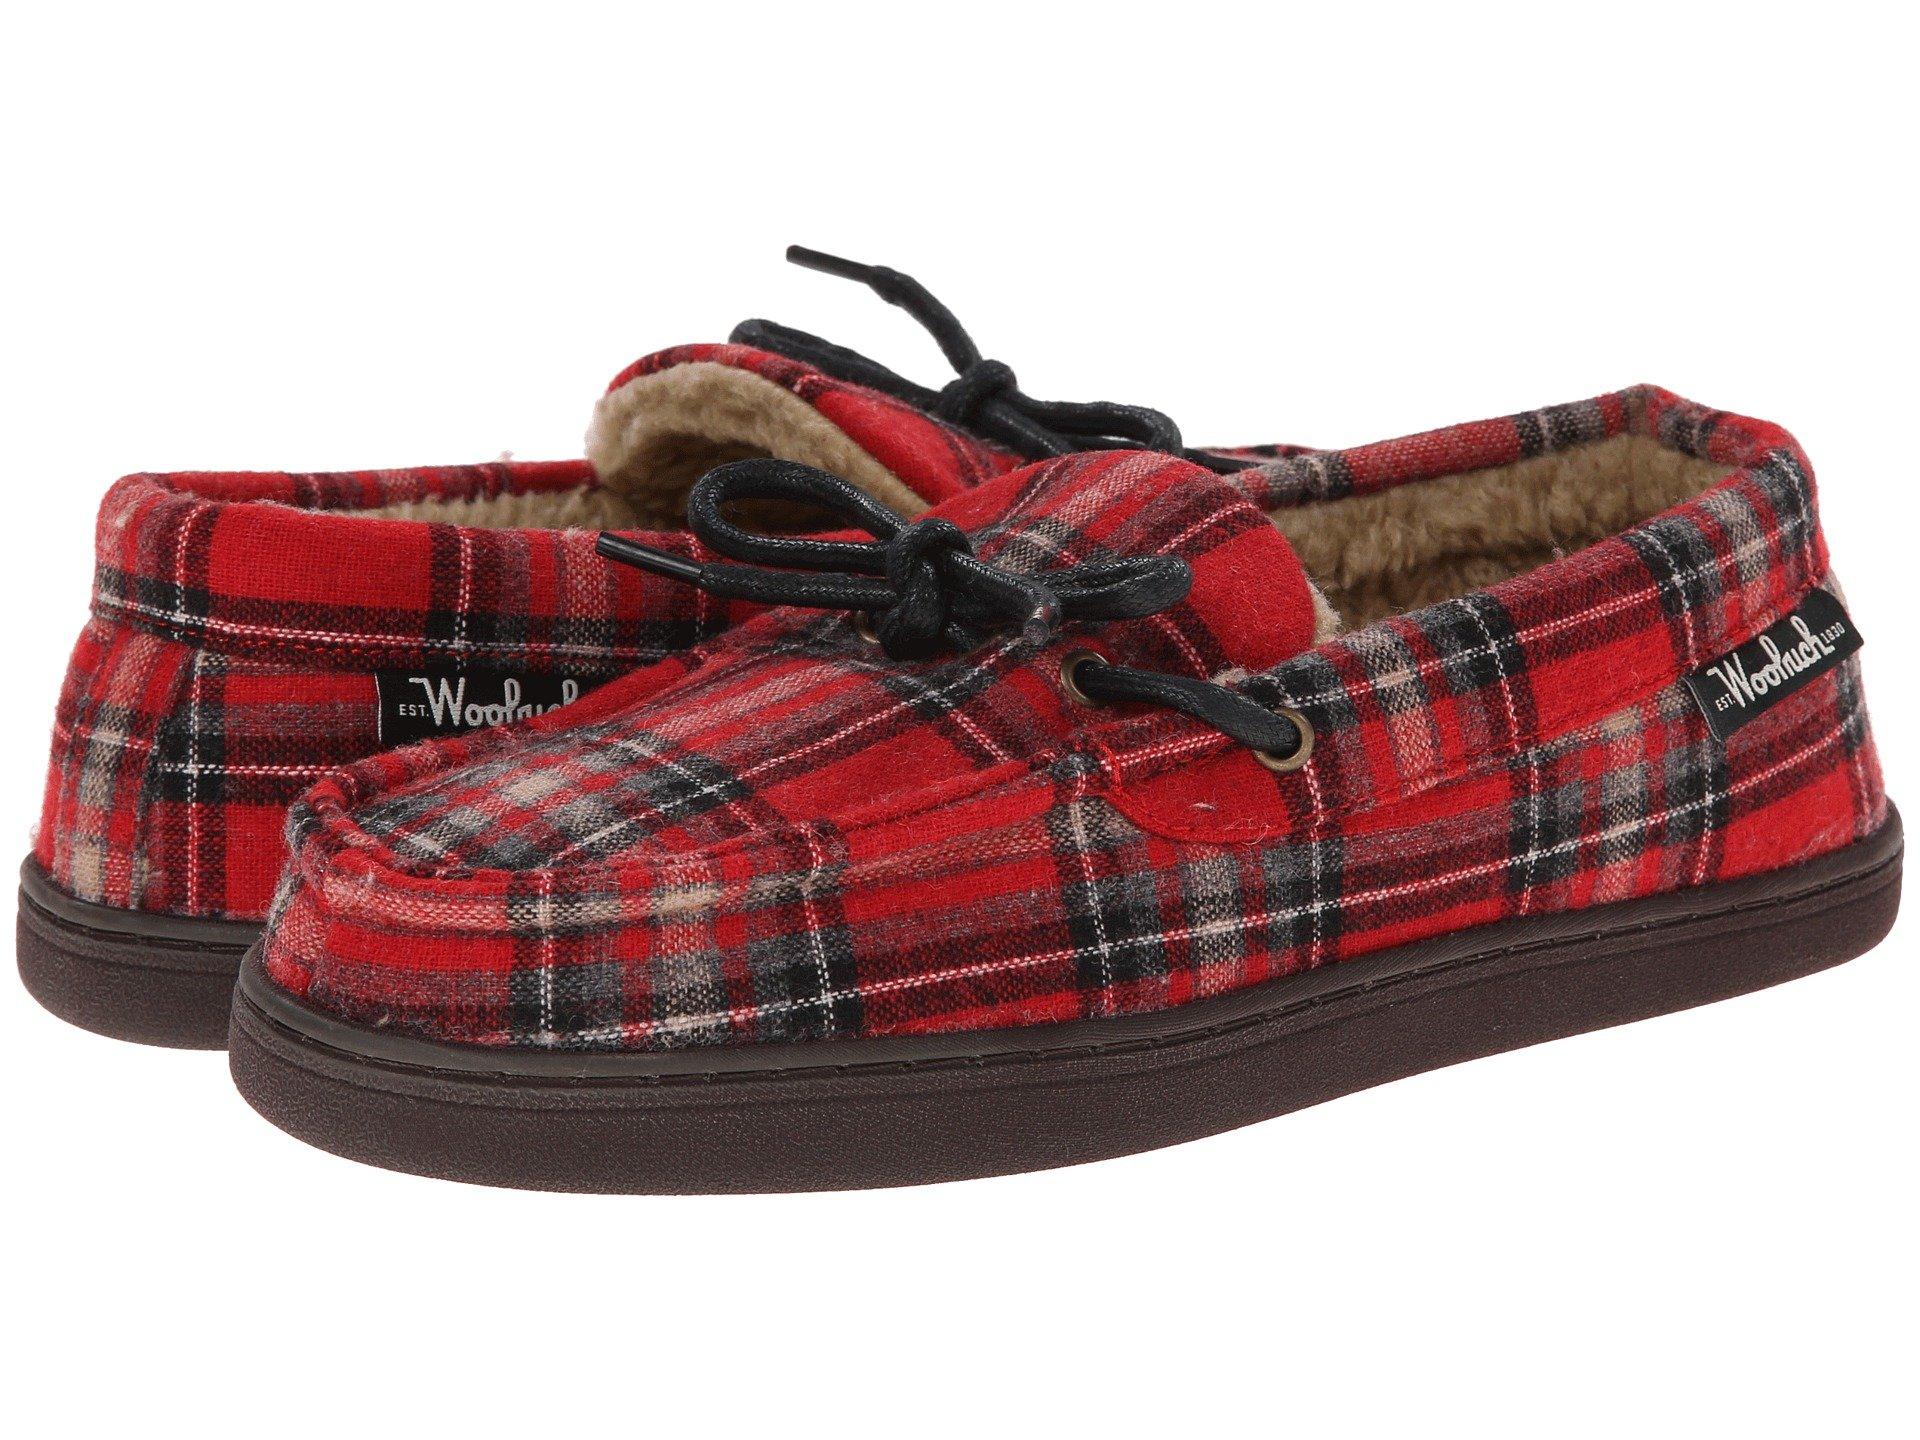 Zapatos de Descanso para Hombre Woolrich Lewisburg  + Woolrich en VeoyCompro.net